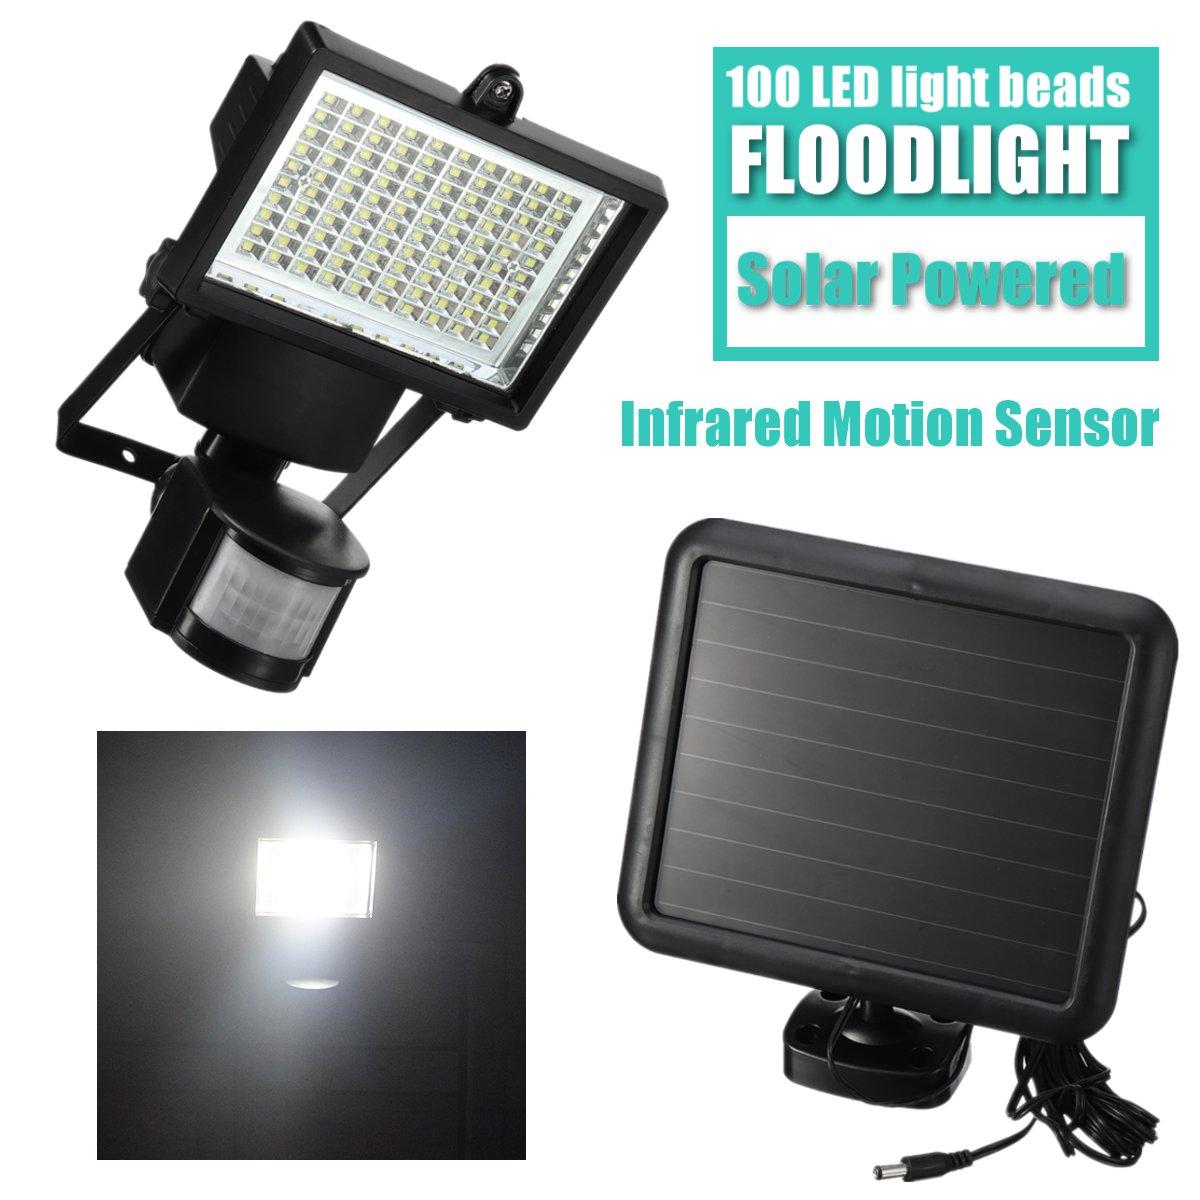 100LED Solar Powered Floodlight Spotlight Projector Lamp Infrared Motion Sensor Security Light Outdoor Lamp PIR For Garden